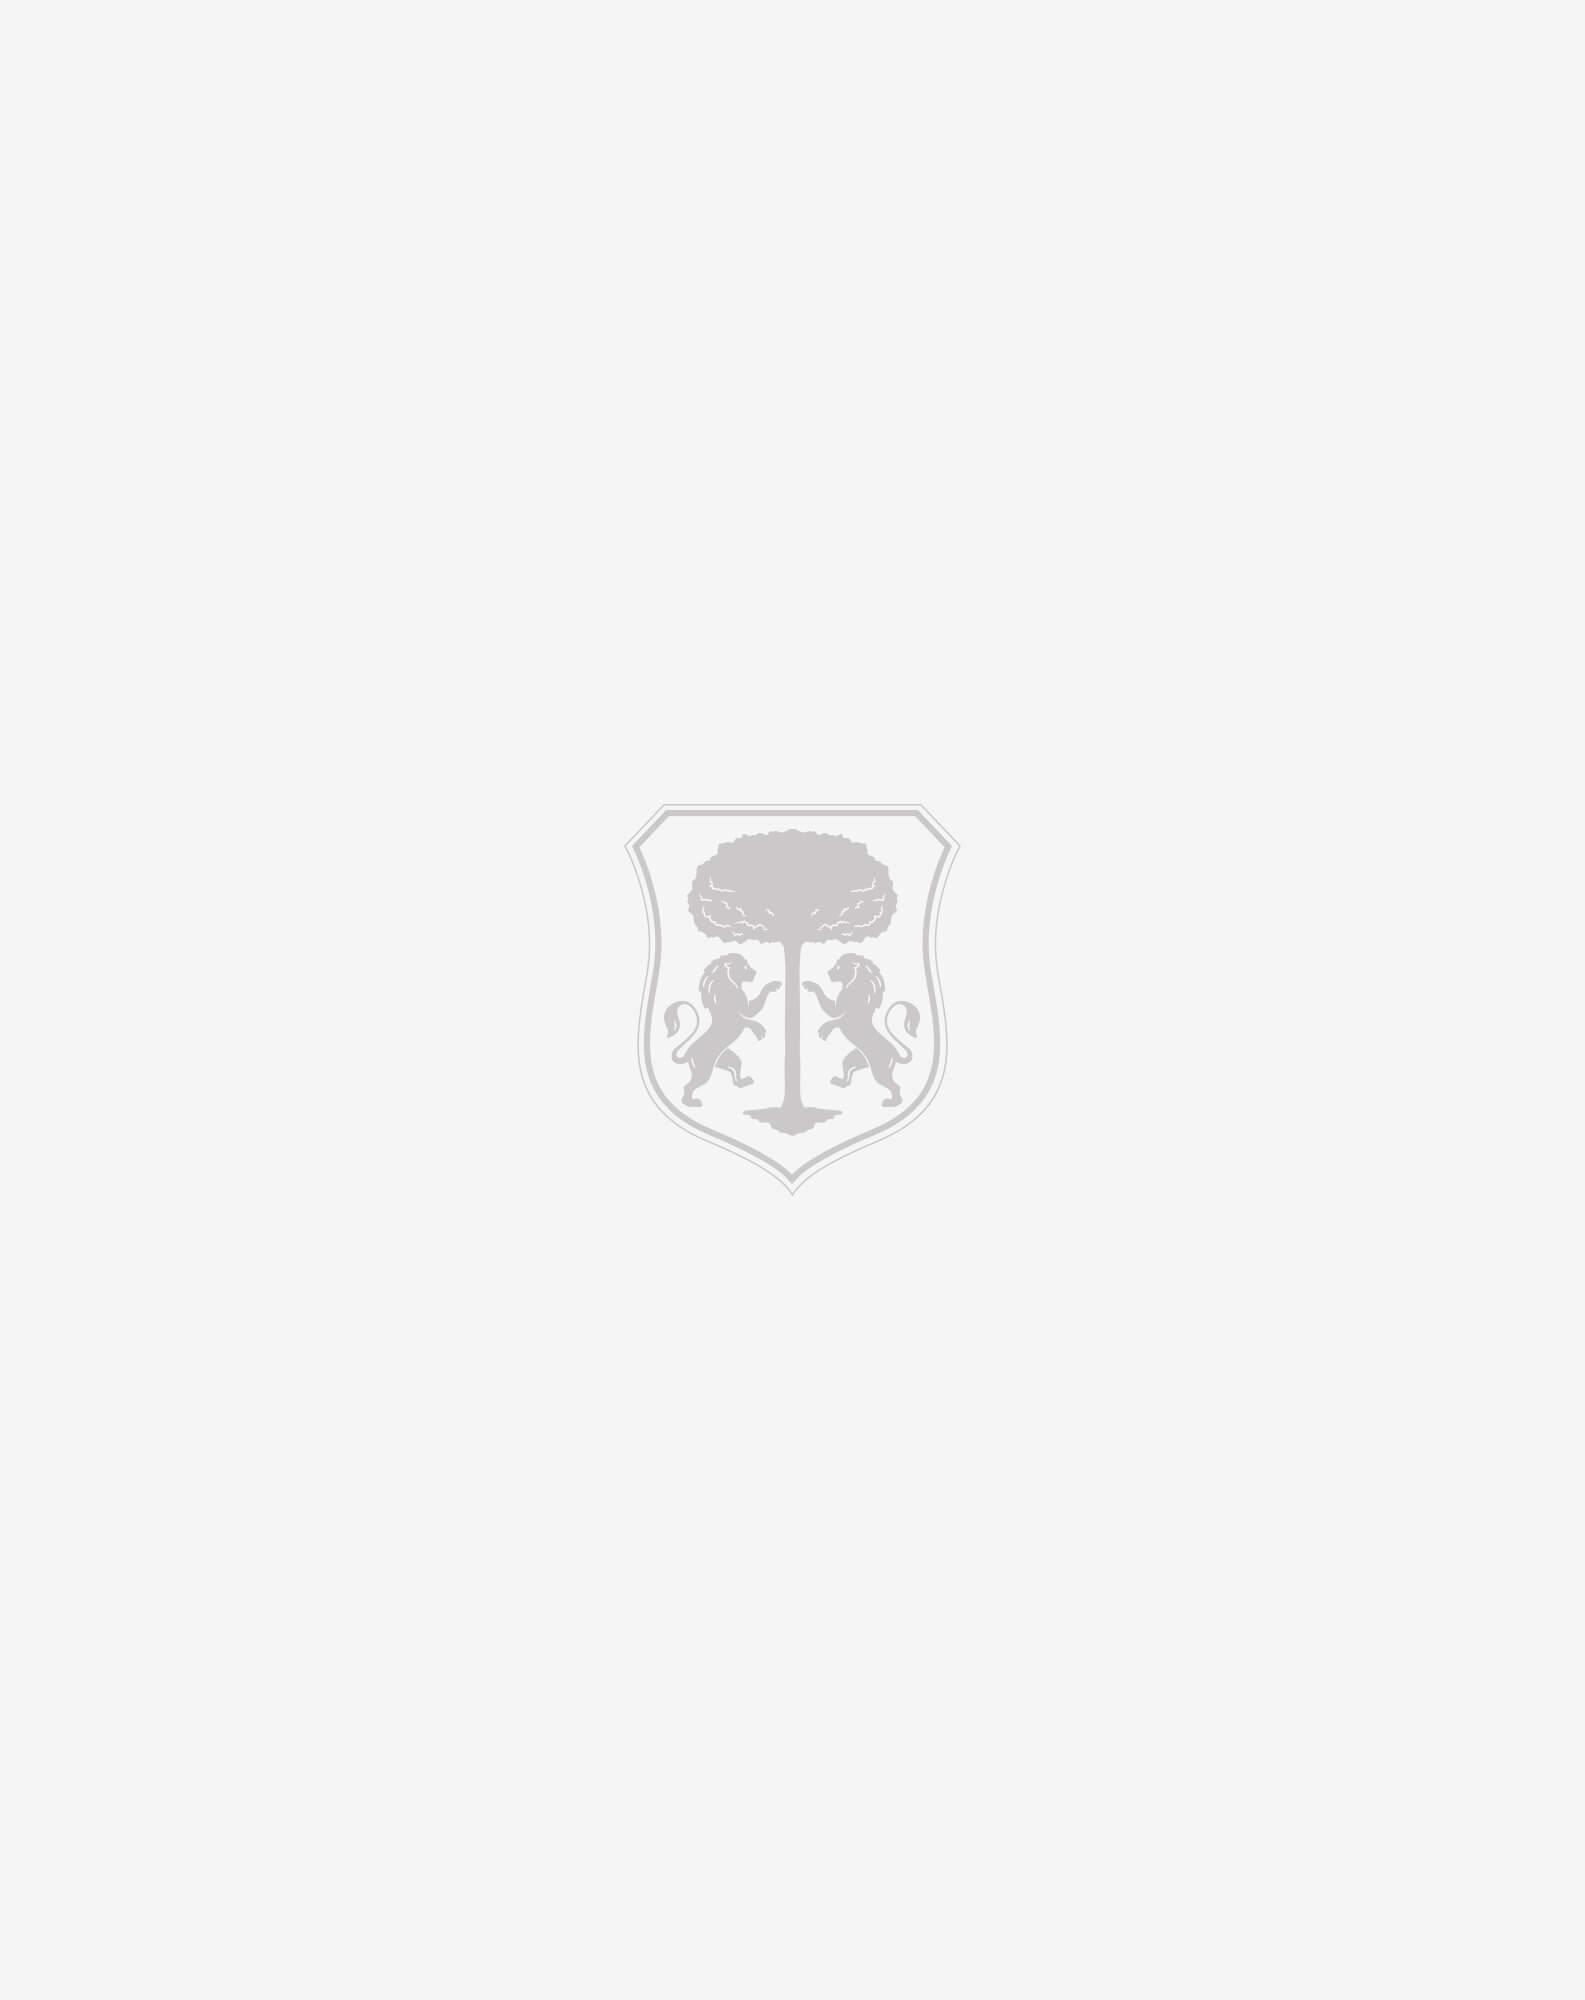 Style&Freedom fleece trousers